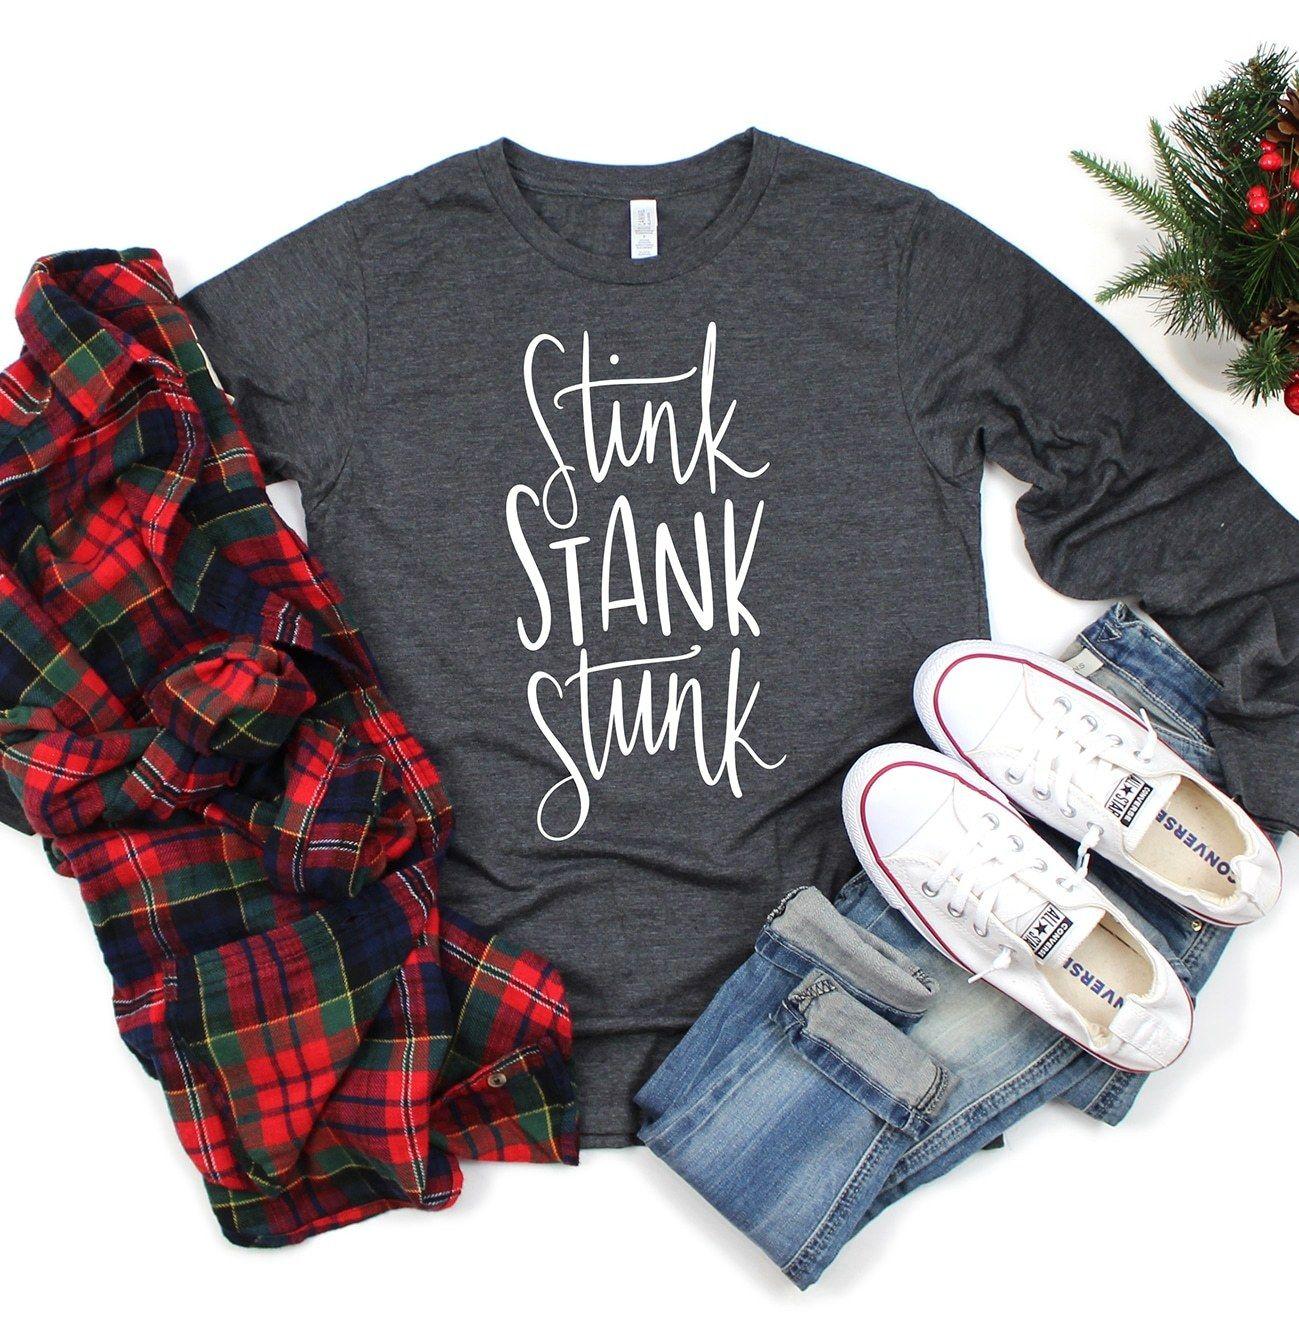 Stink stank stunk svg, Stink stank stunk, Stink stank